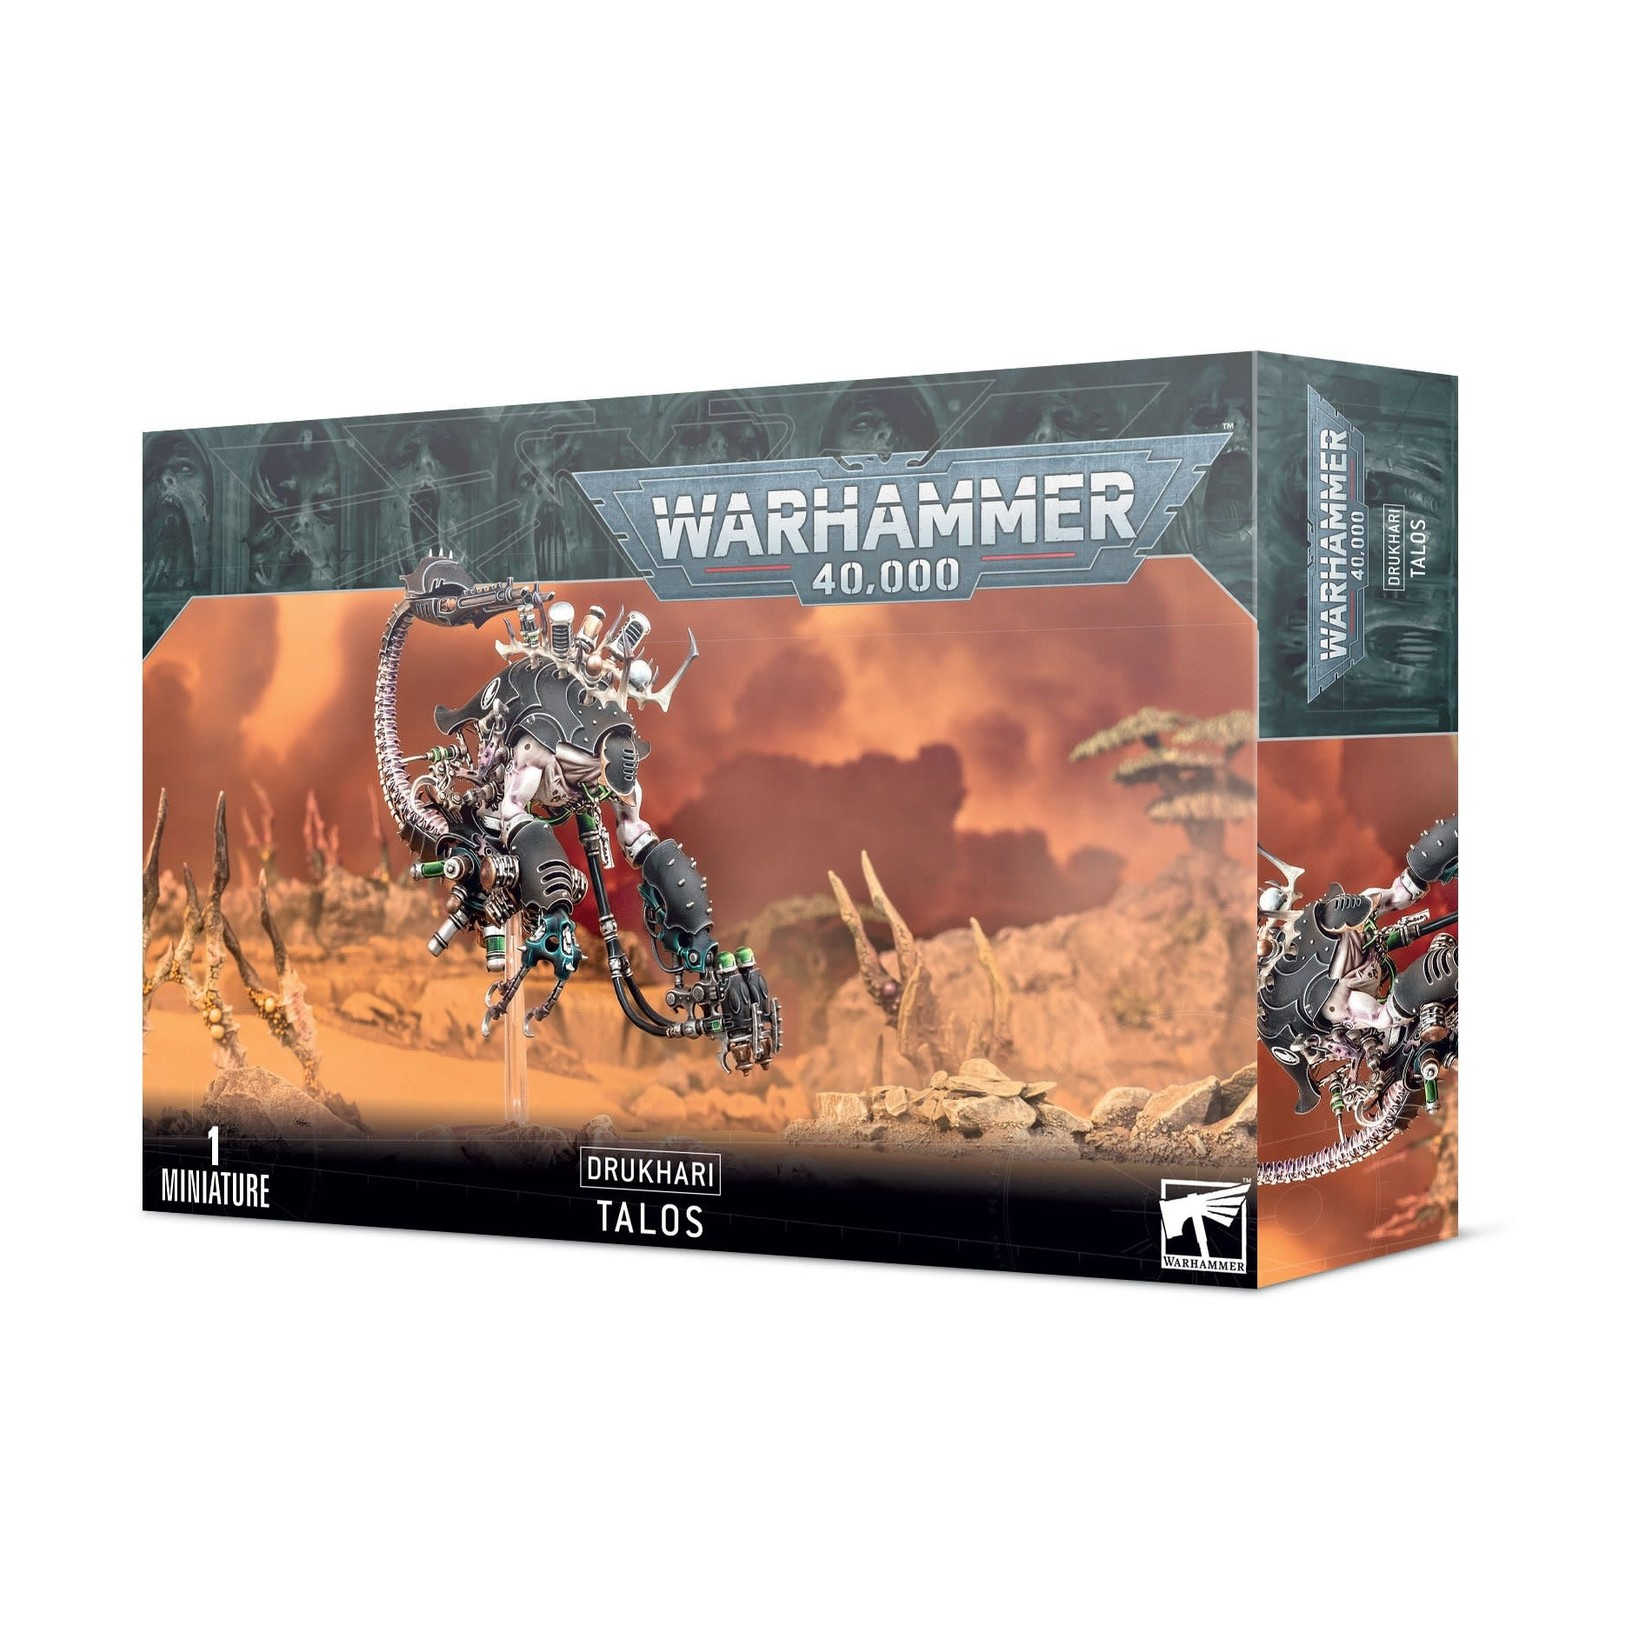 Games Workshop Warhammer 40k: Drukhari - Talos